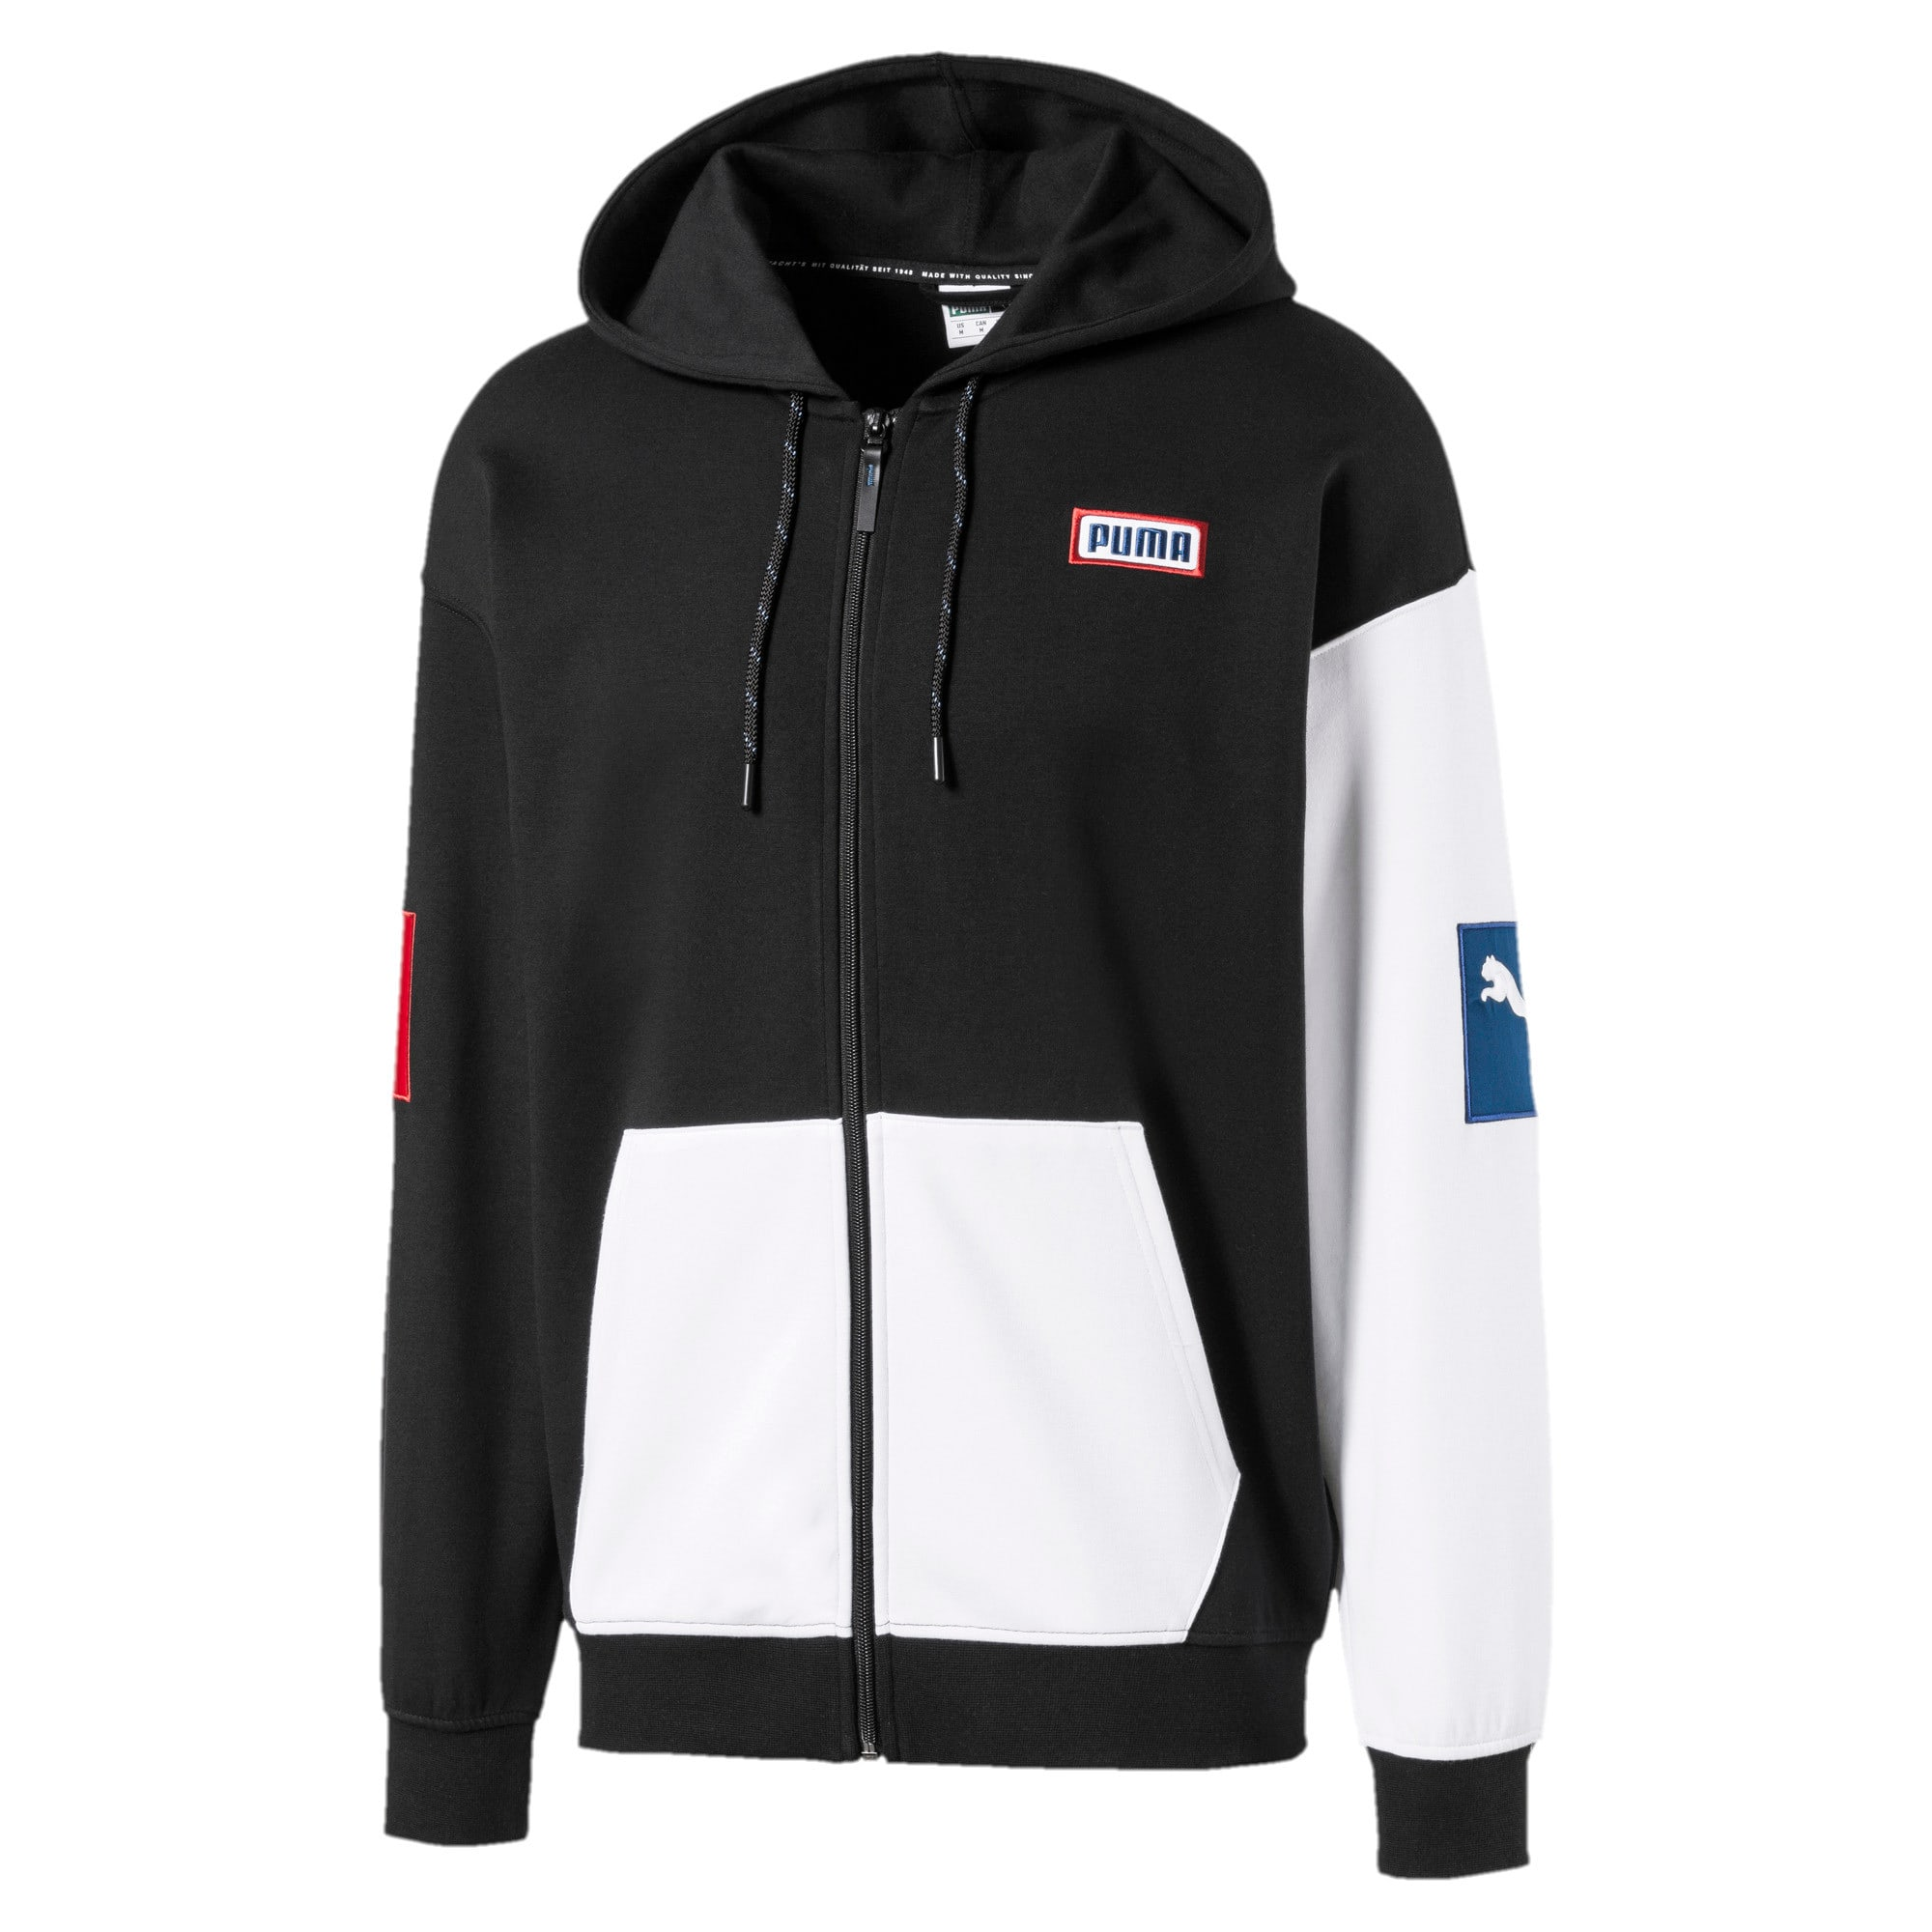 Thumbnail 1 of Colour Block Hooded Men's Sweat Jacket, Puma Black, medium